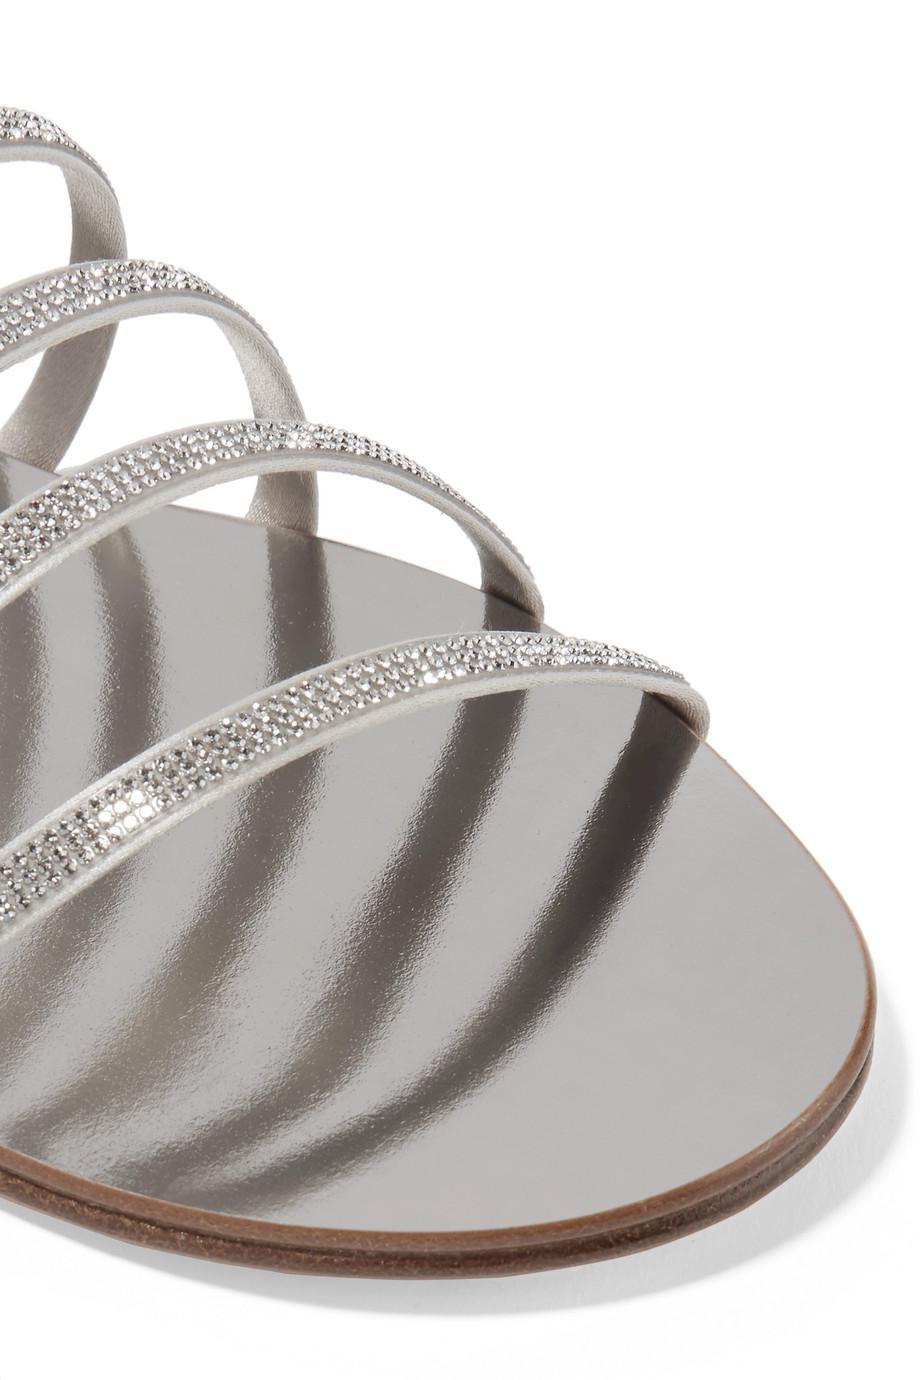 Amazing Price For Sale Pedro Garcia Sarah Swarovski Crystal-embellished Satin And Metallic Leather Sandals Buy Cheap Release Dates Finishline For Sale Geniue Stockist Sale Online Cheap Sale Explore FFVfkksGAx